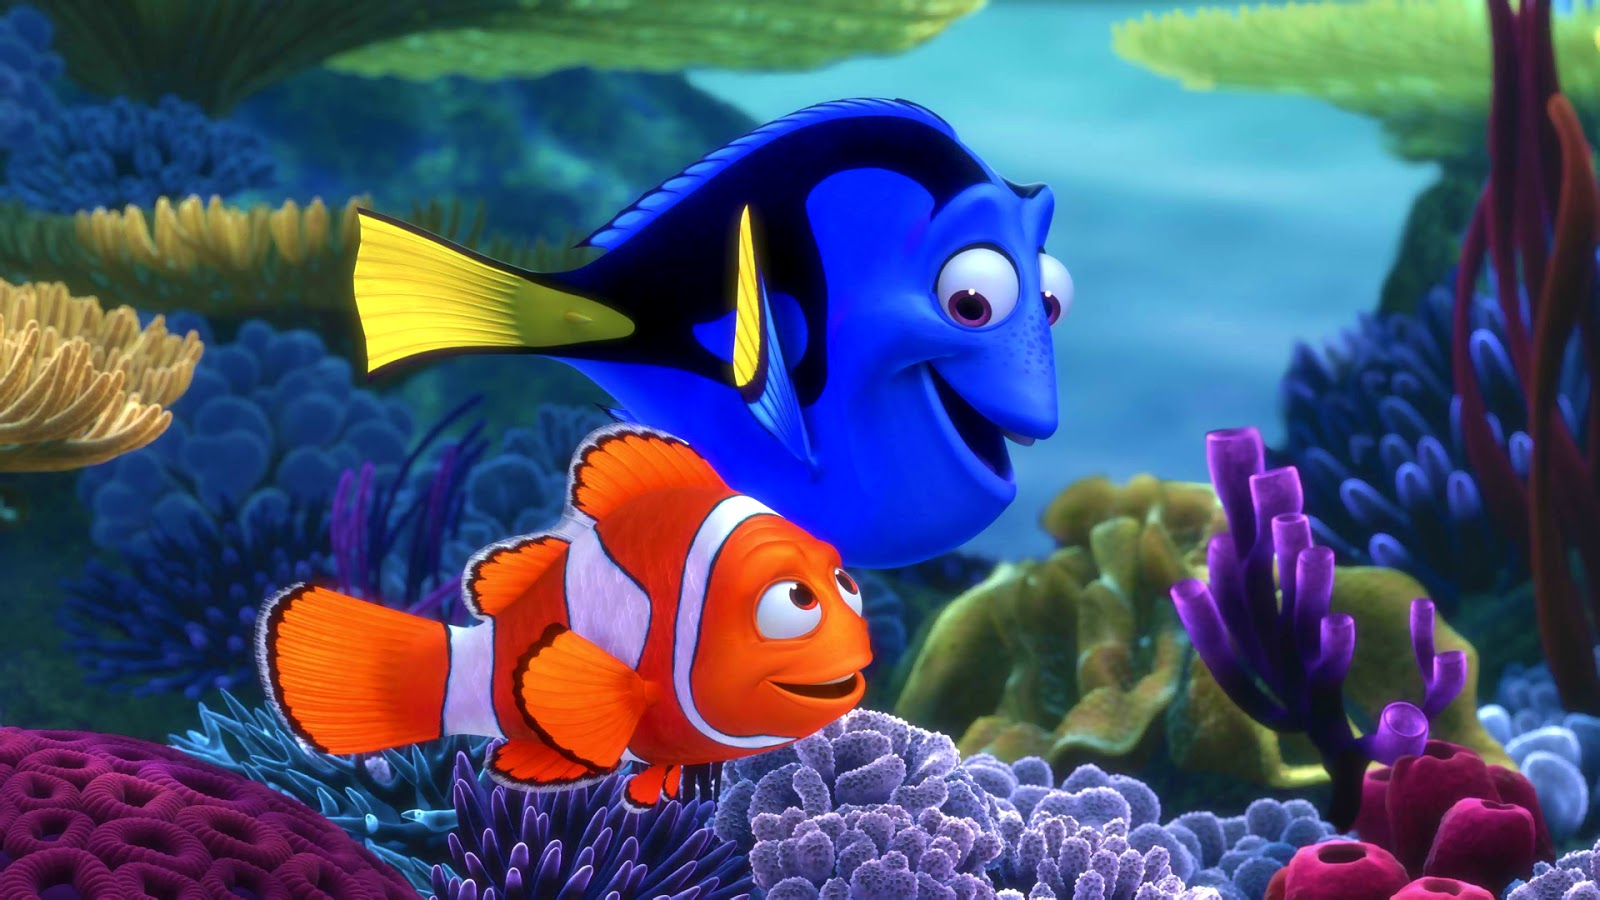 Wallpaper Mansion Finding Nemo 3d Wallpaper